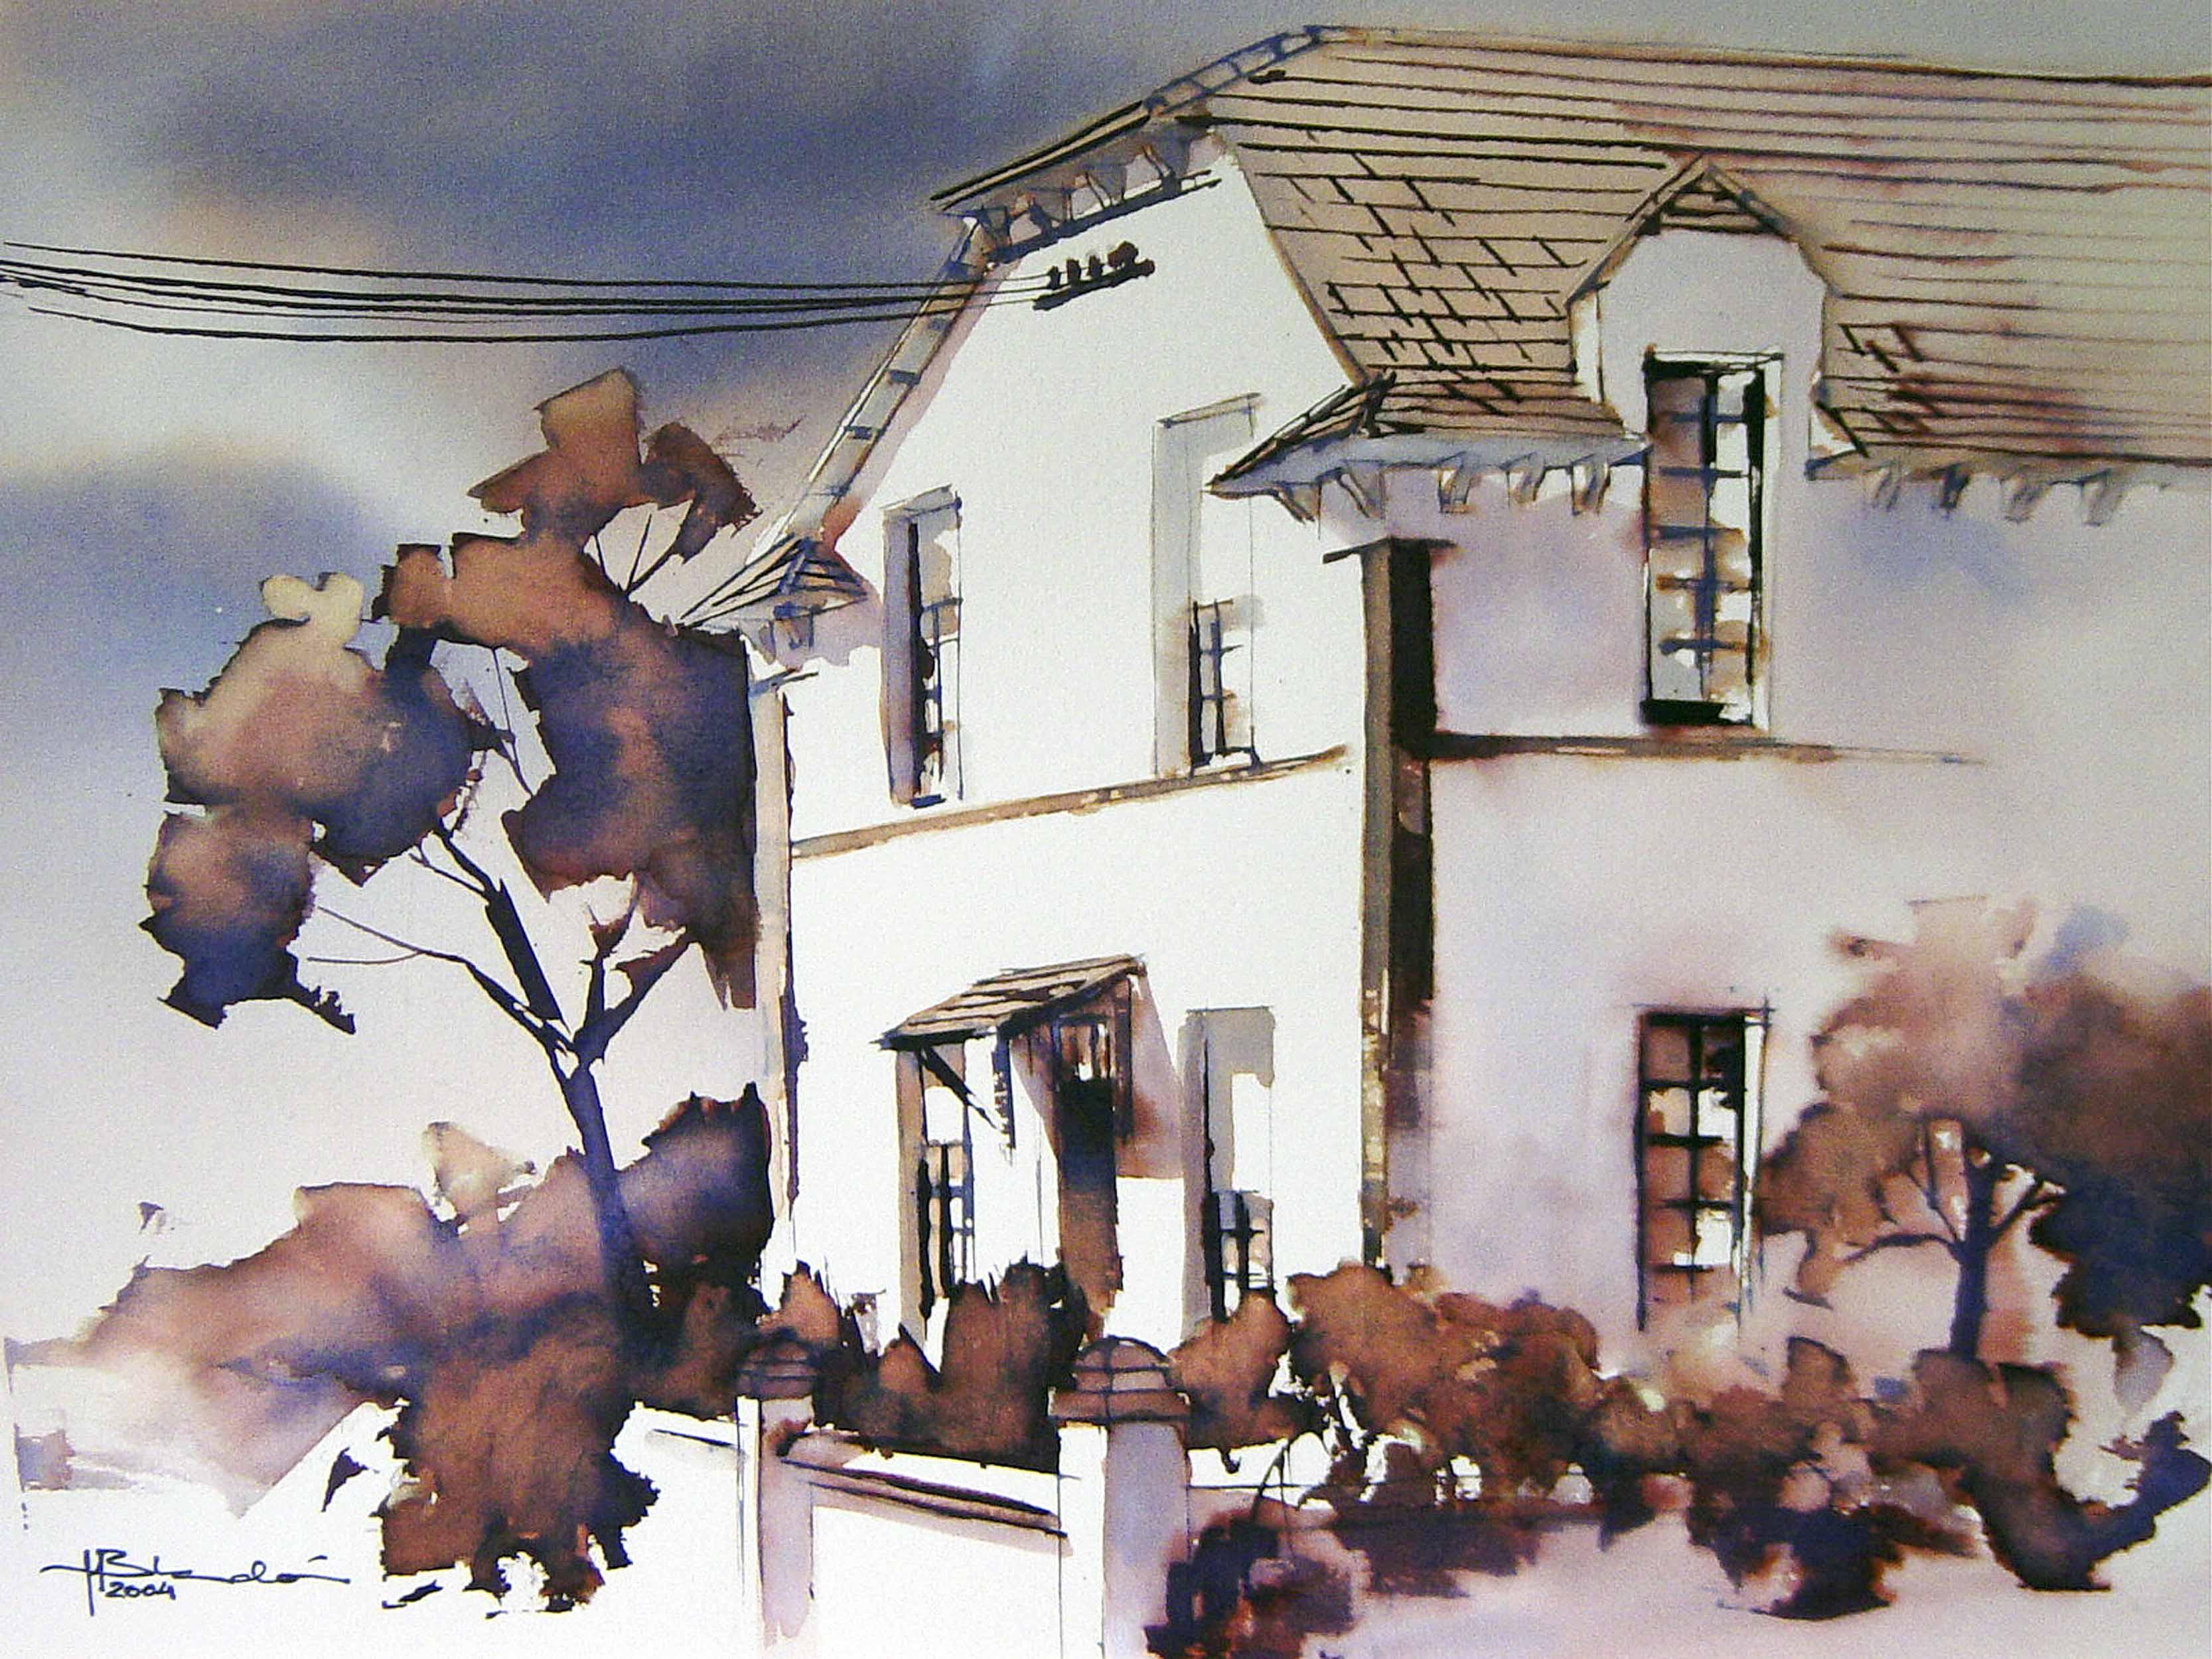 Manuel Blandón - Casa del barrio inglés (Huelva)